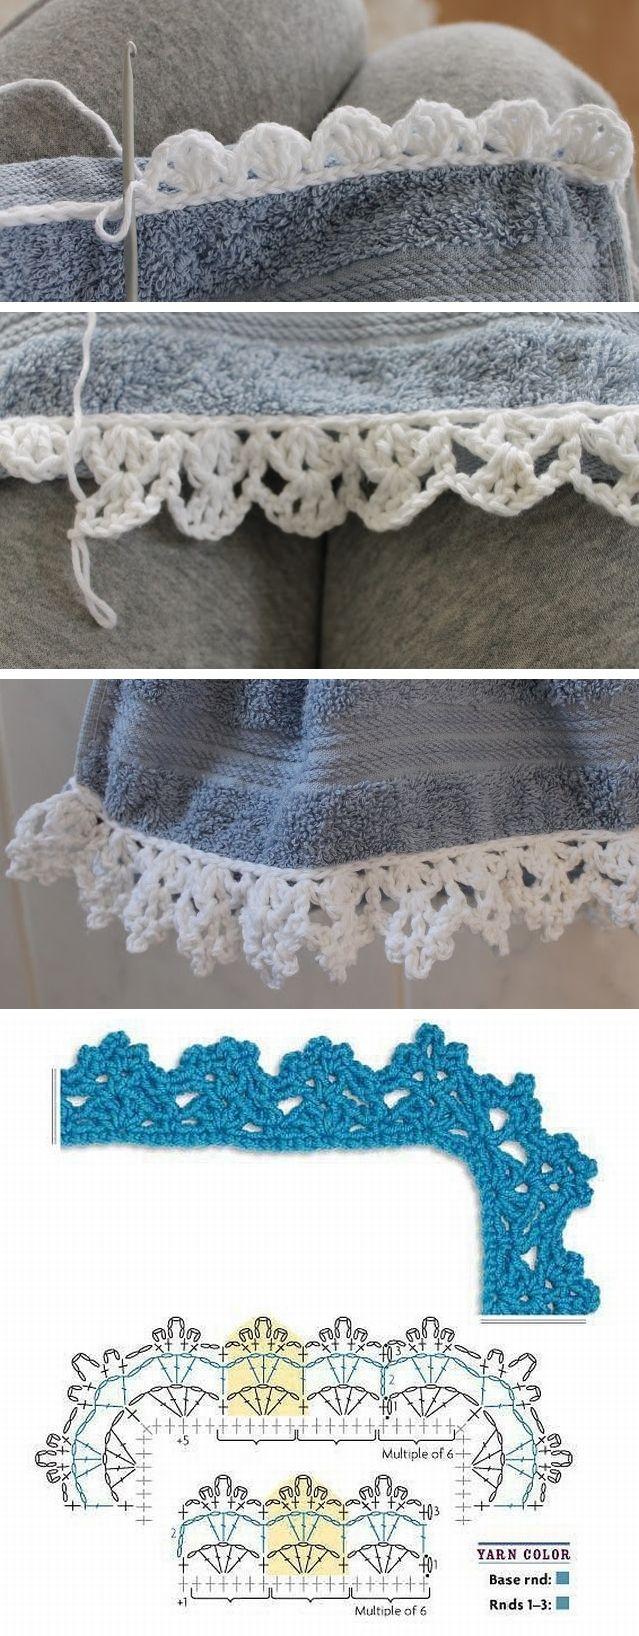 Lace edging pattern diagram . . . . ღTrish W ~ http://www.pinterest.com/trishw/ . . . . #crochet